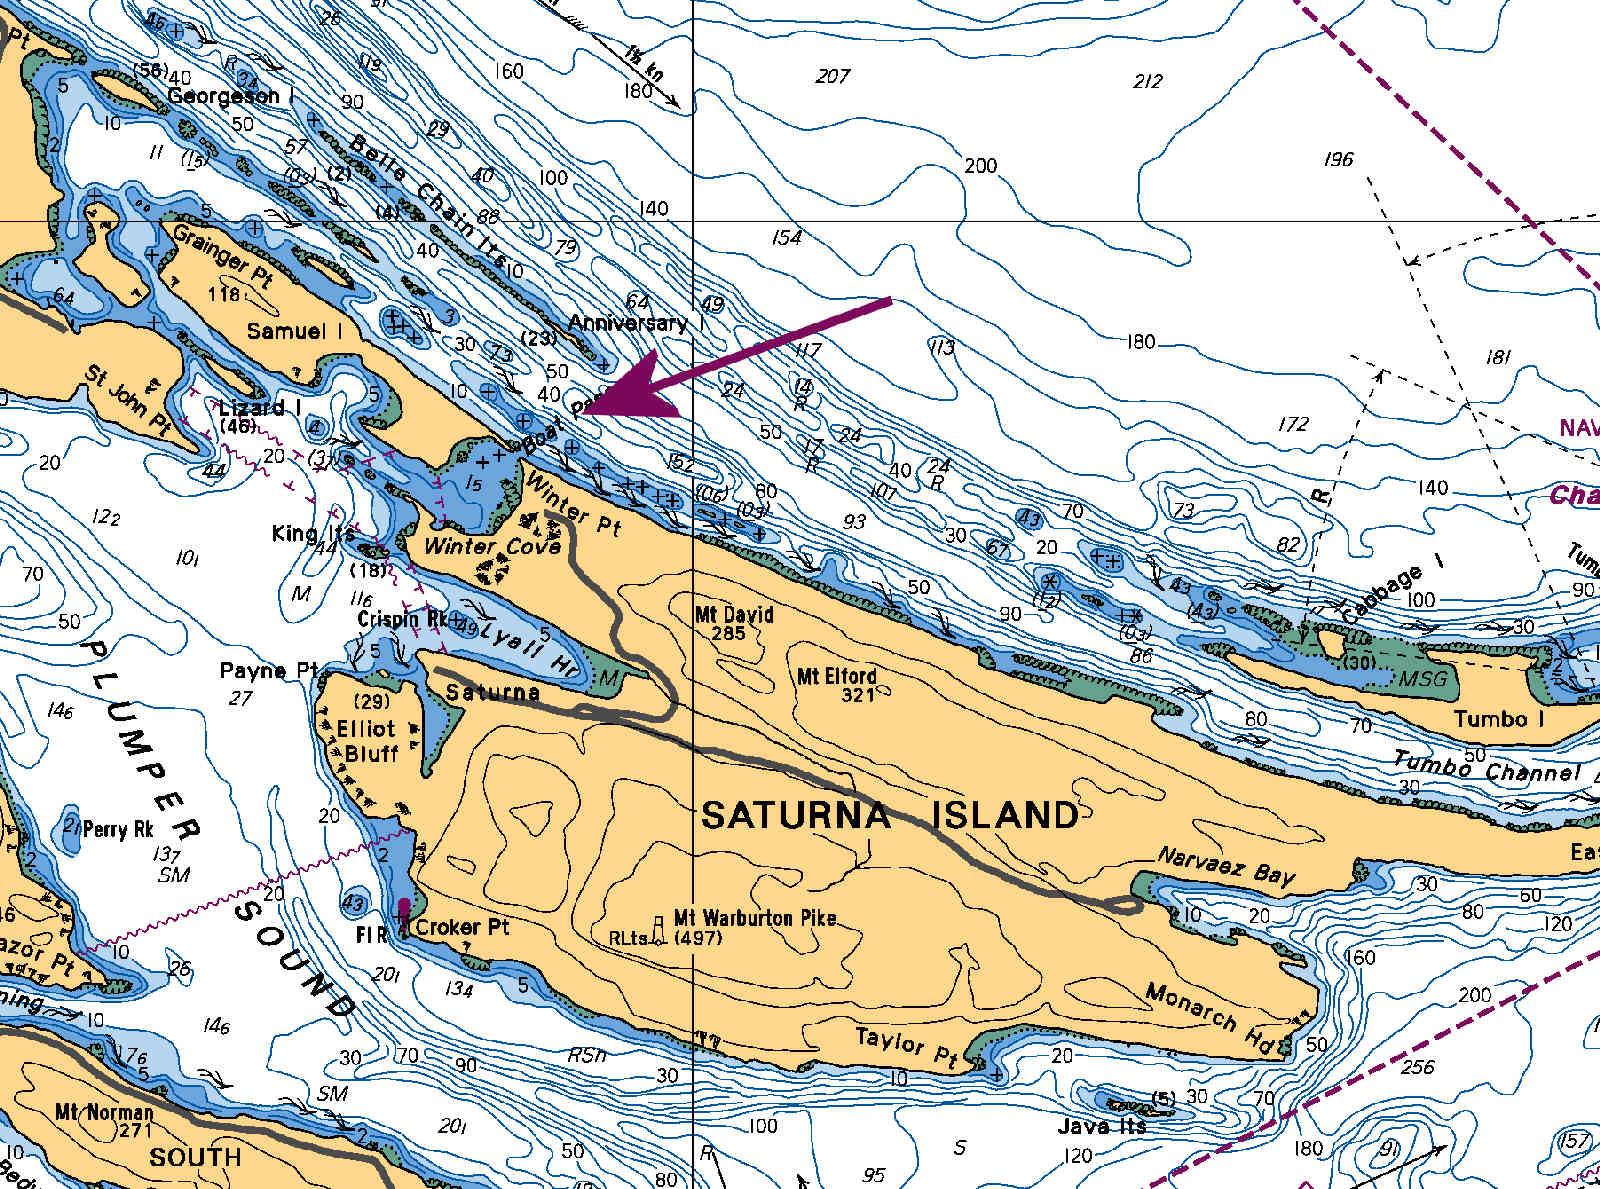 Click image for larger version  Name:saturnaisland.jpg Views:153 Size:383.8 KB ID:1515